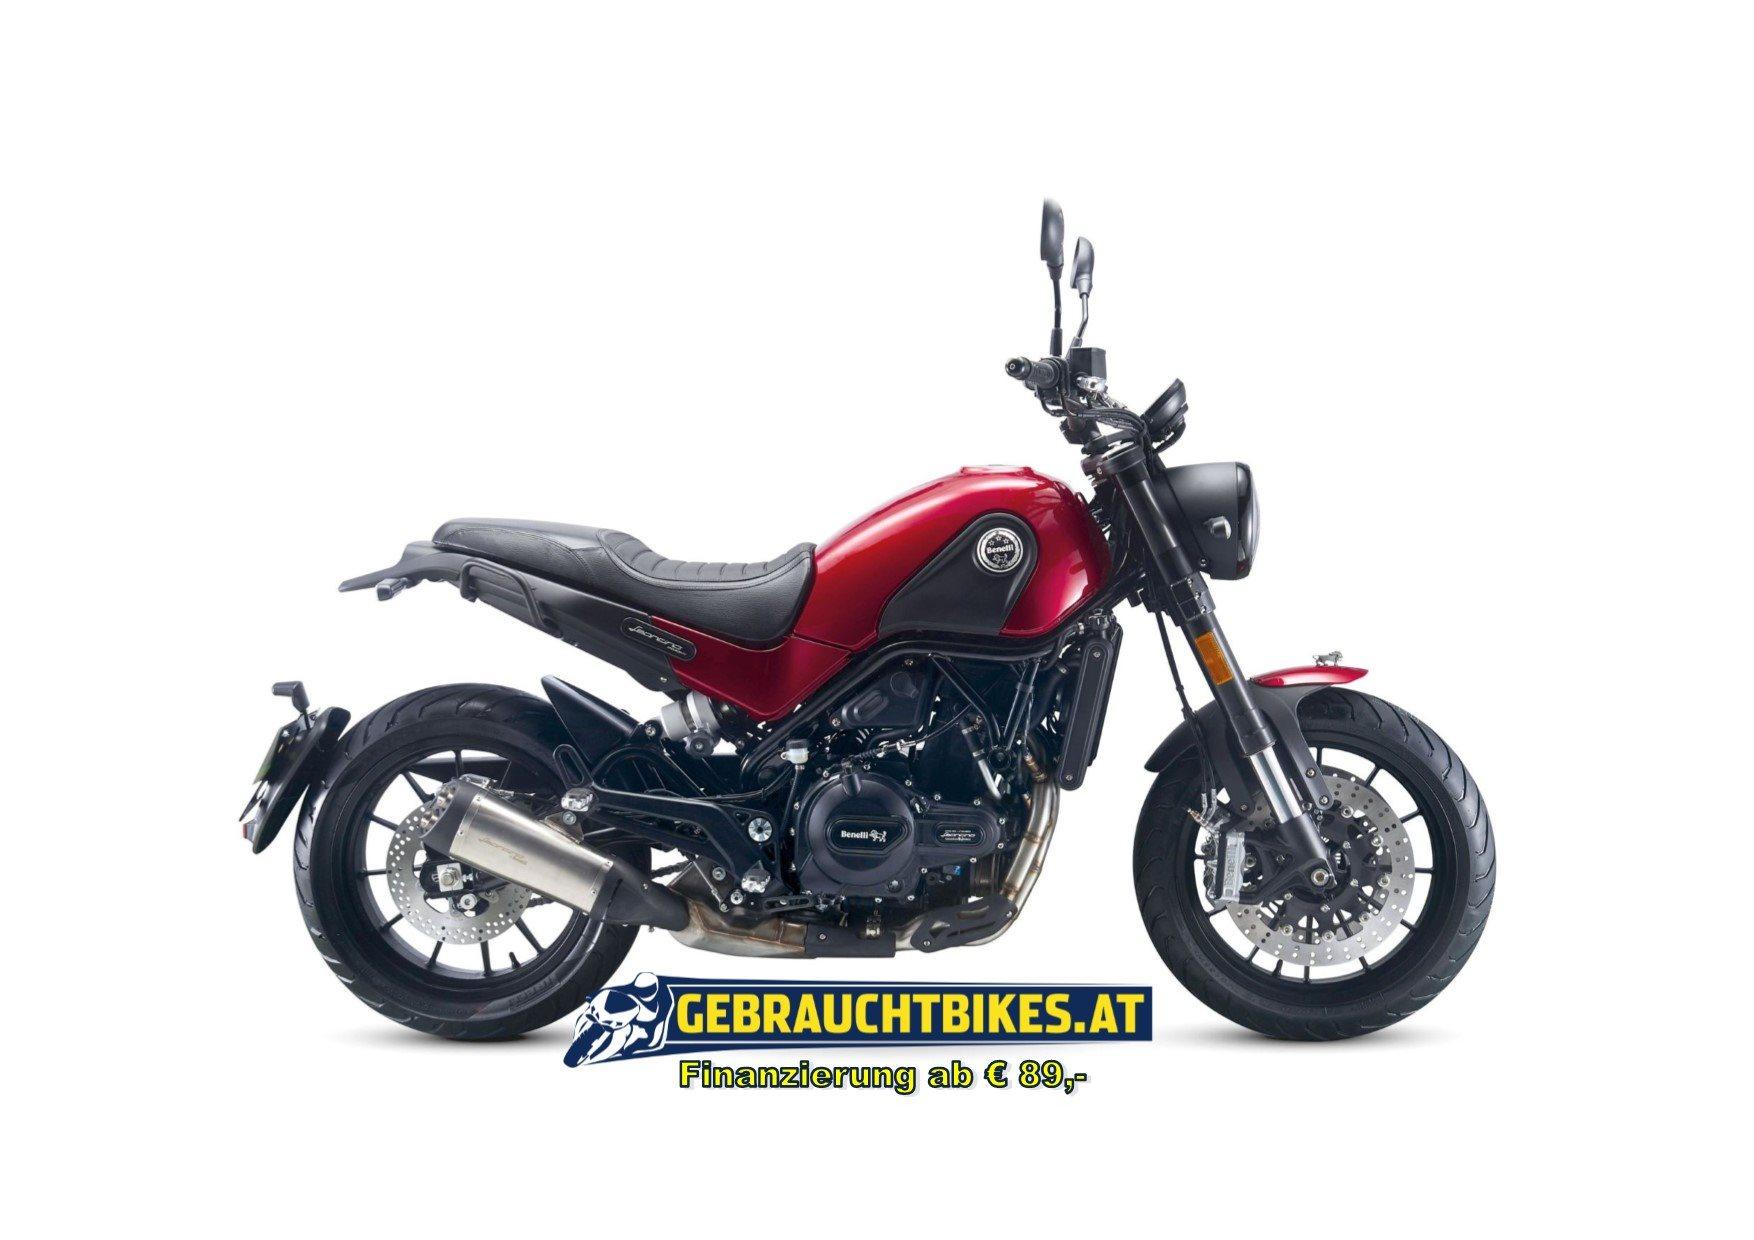 Benelli Leoncino 500 Motorrad, neu